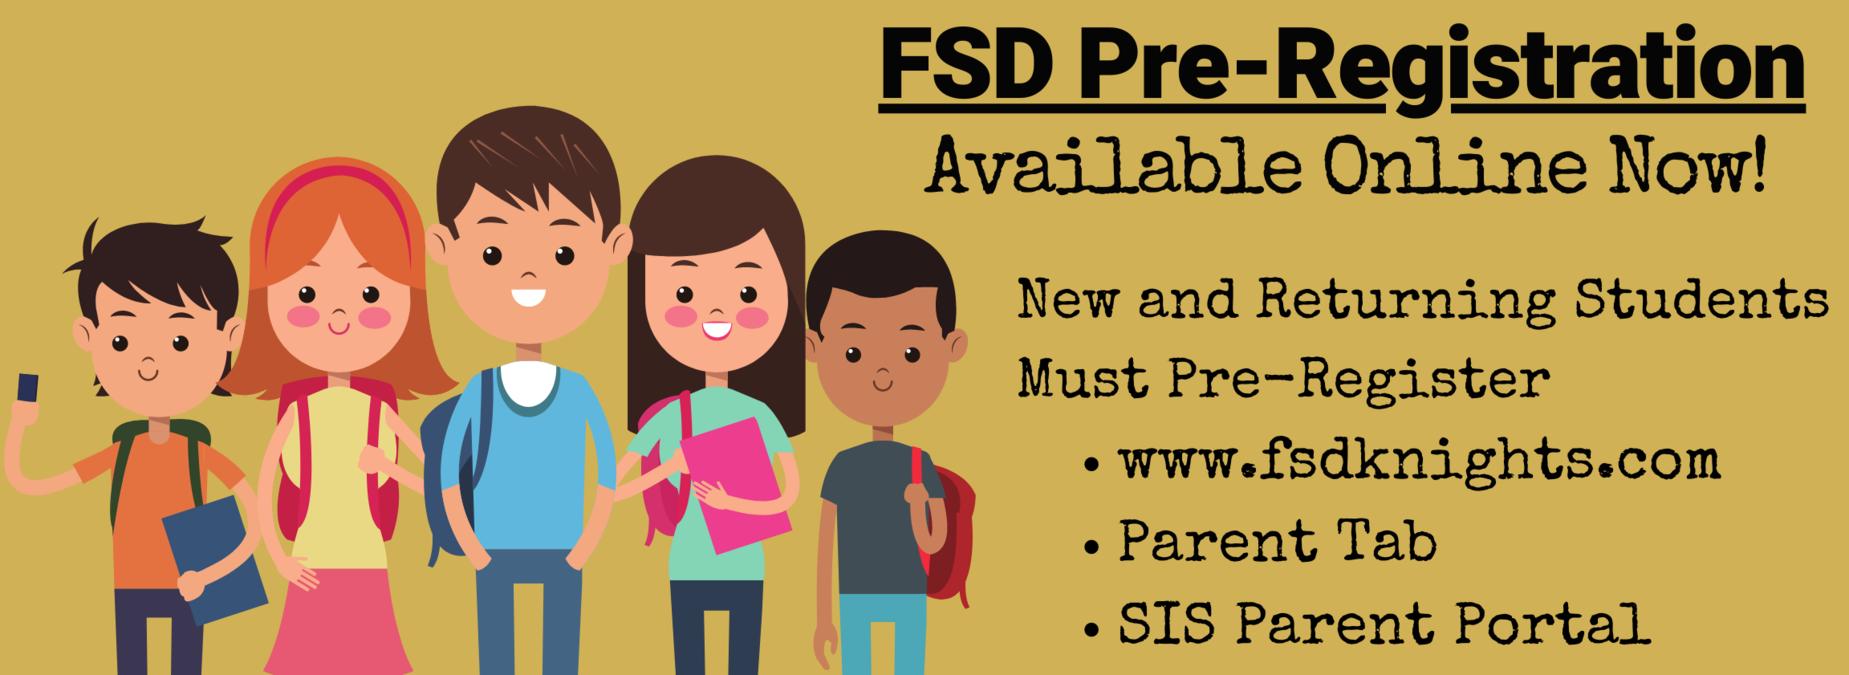 FSD Pre Registration